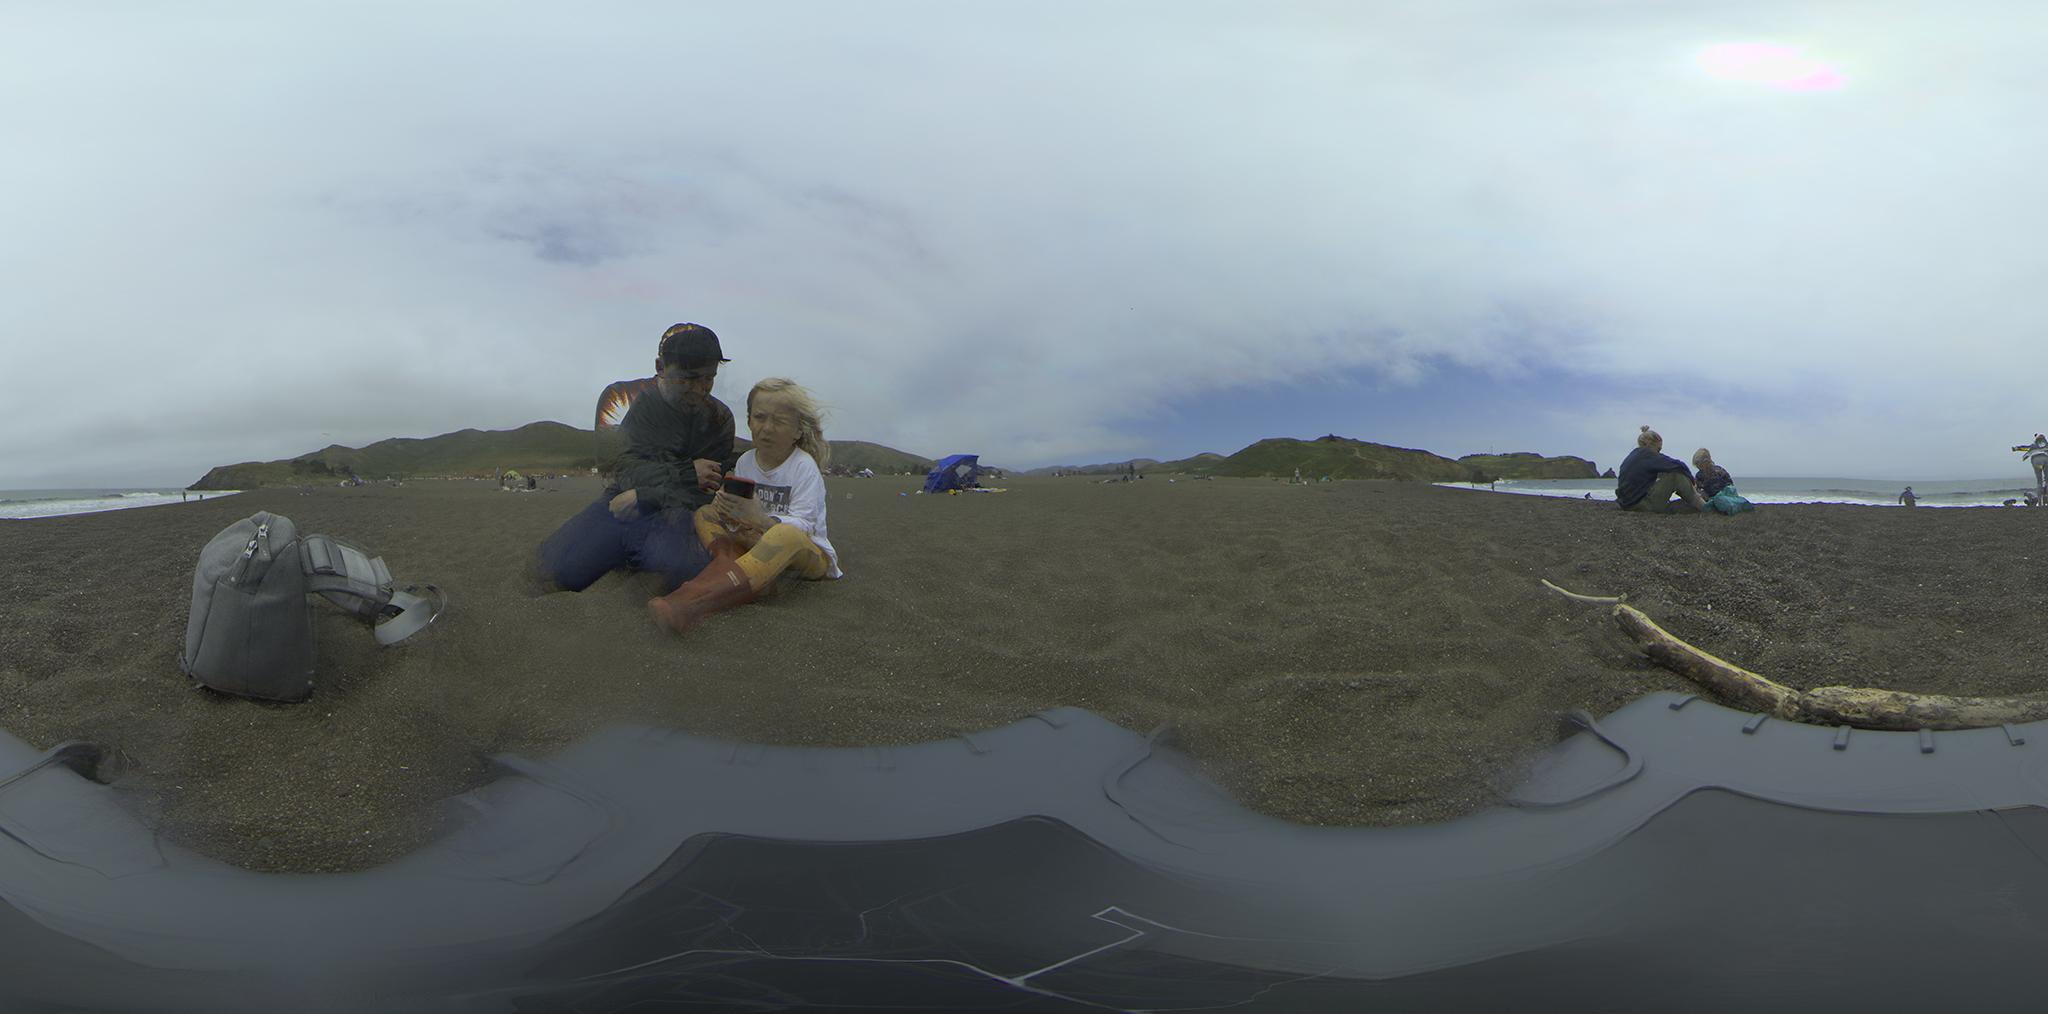 360_beach_saturated.jpg